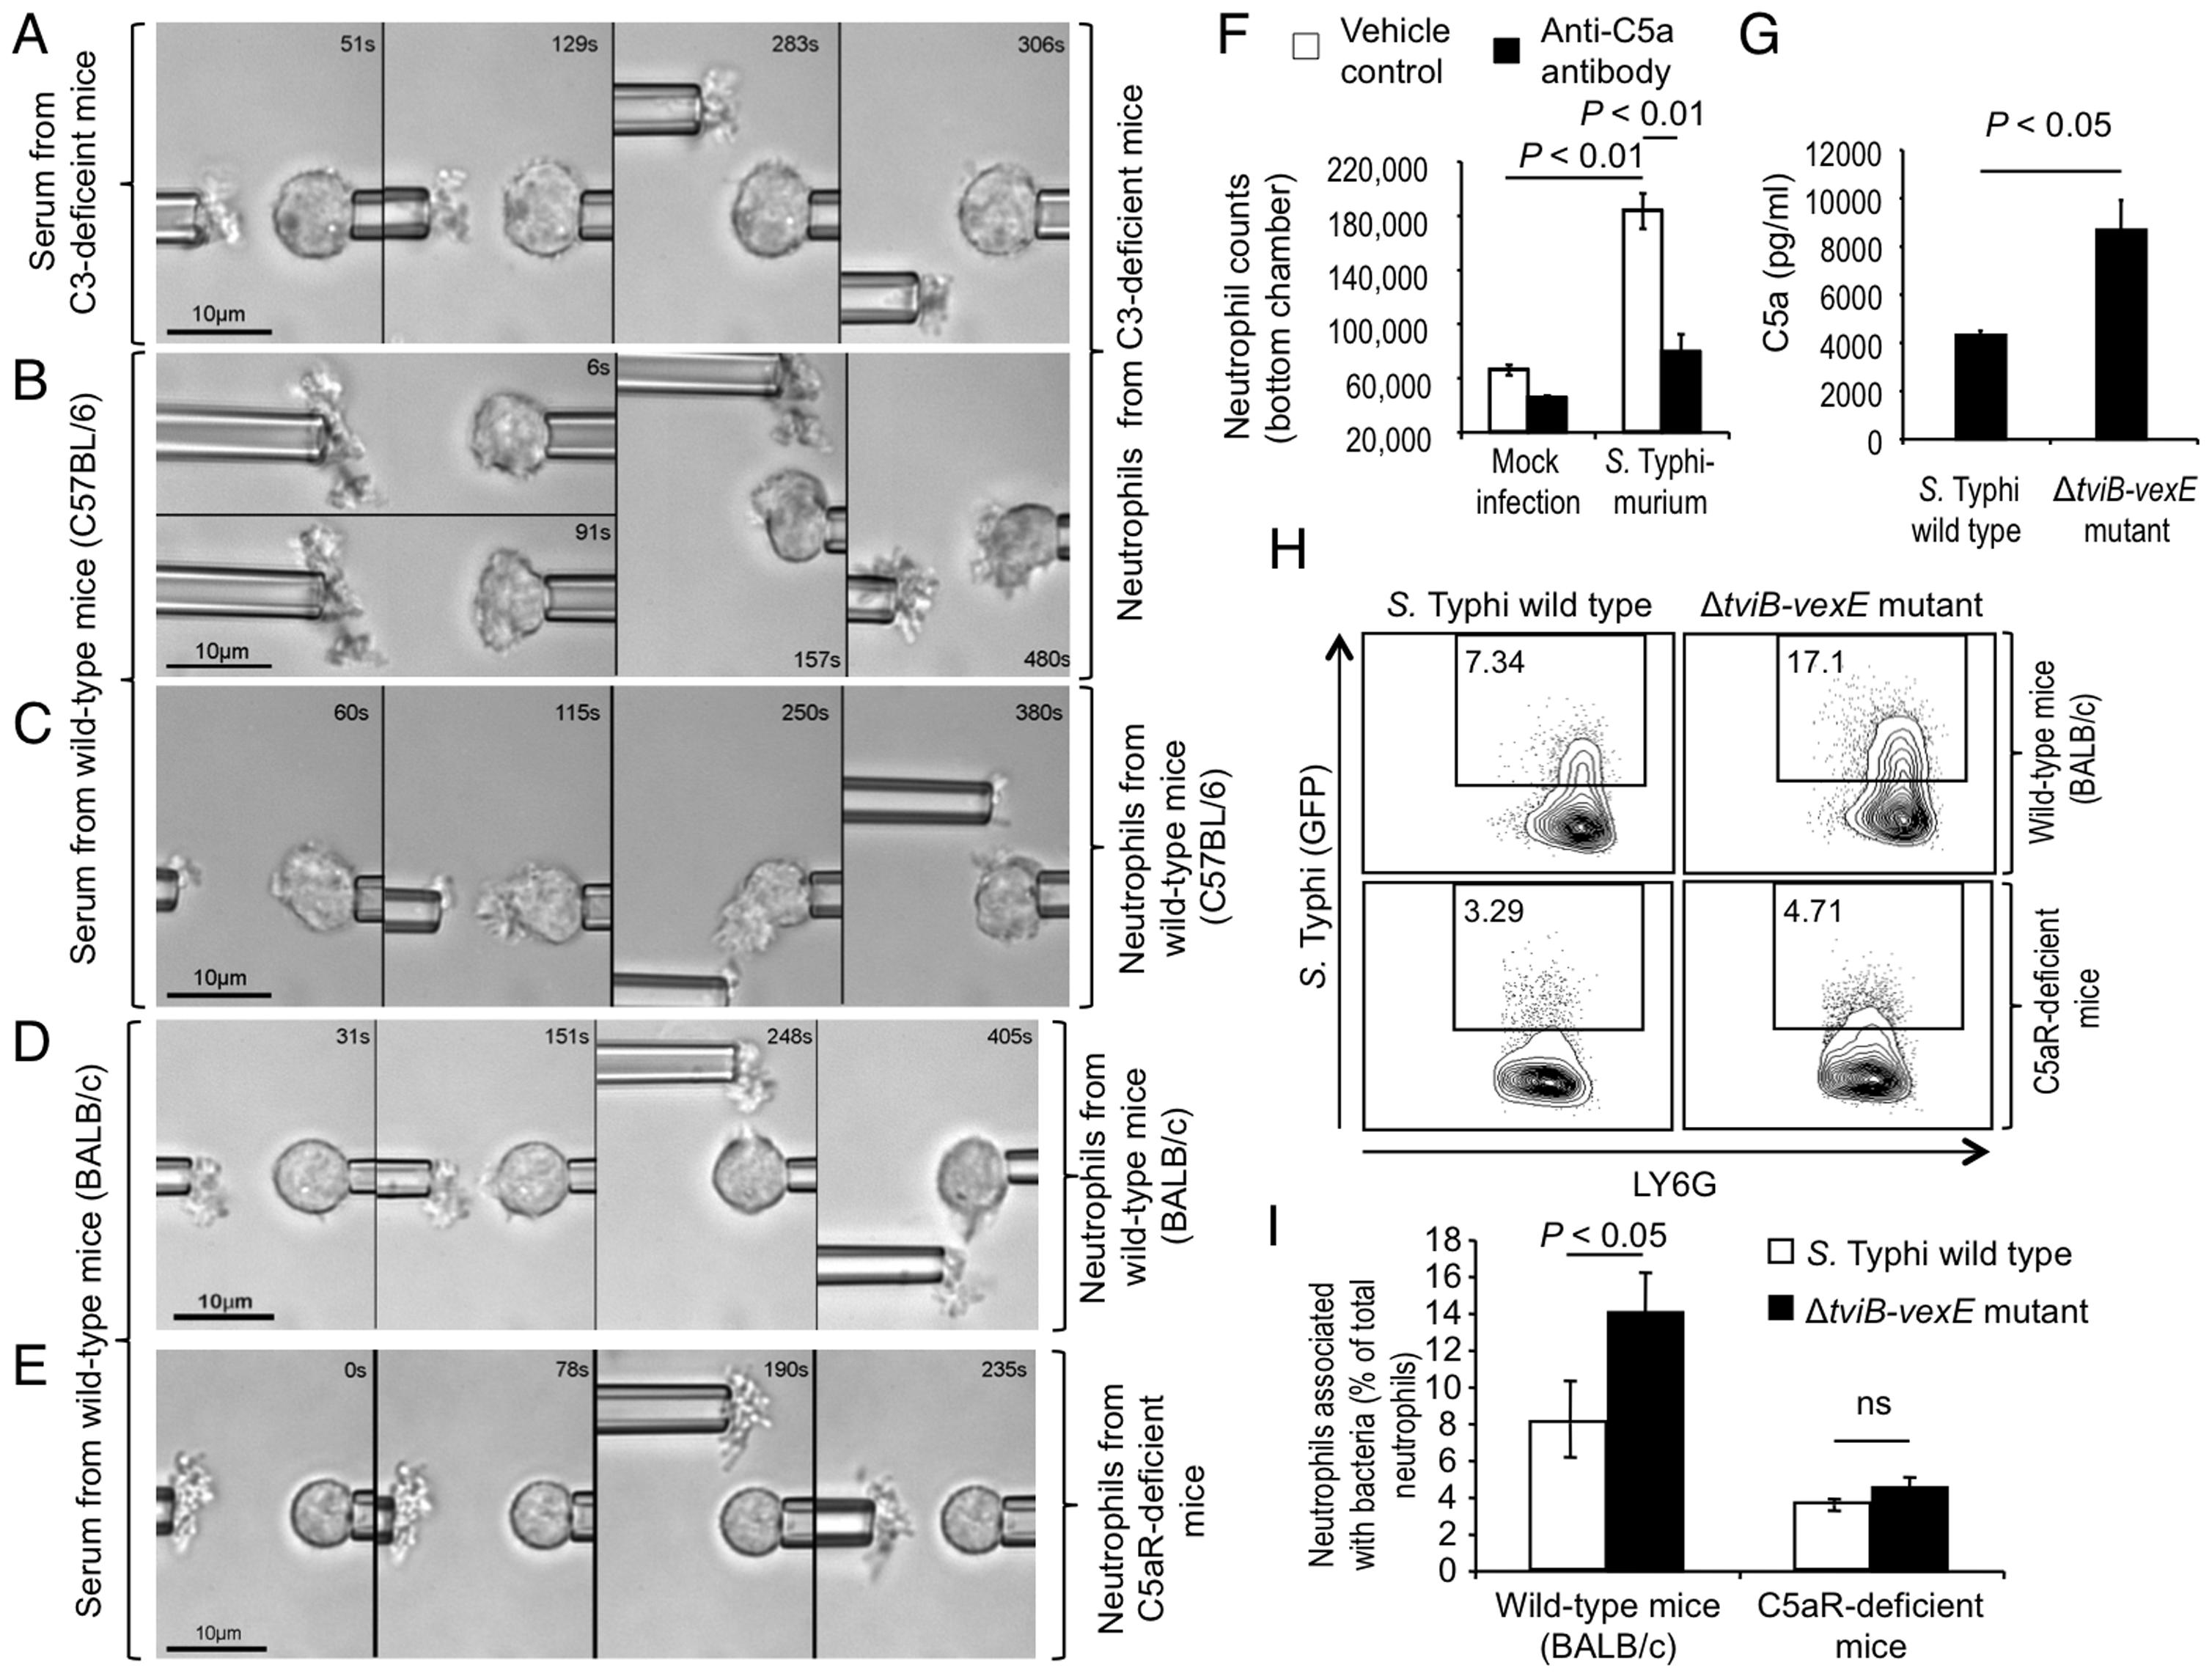 The Vi capsular polysaccharide inhibits chemotactic responses of murine neutrophils <i>in vitro</i> and <i>in vivo</i>.